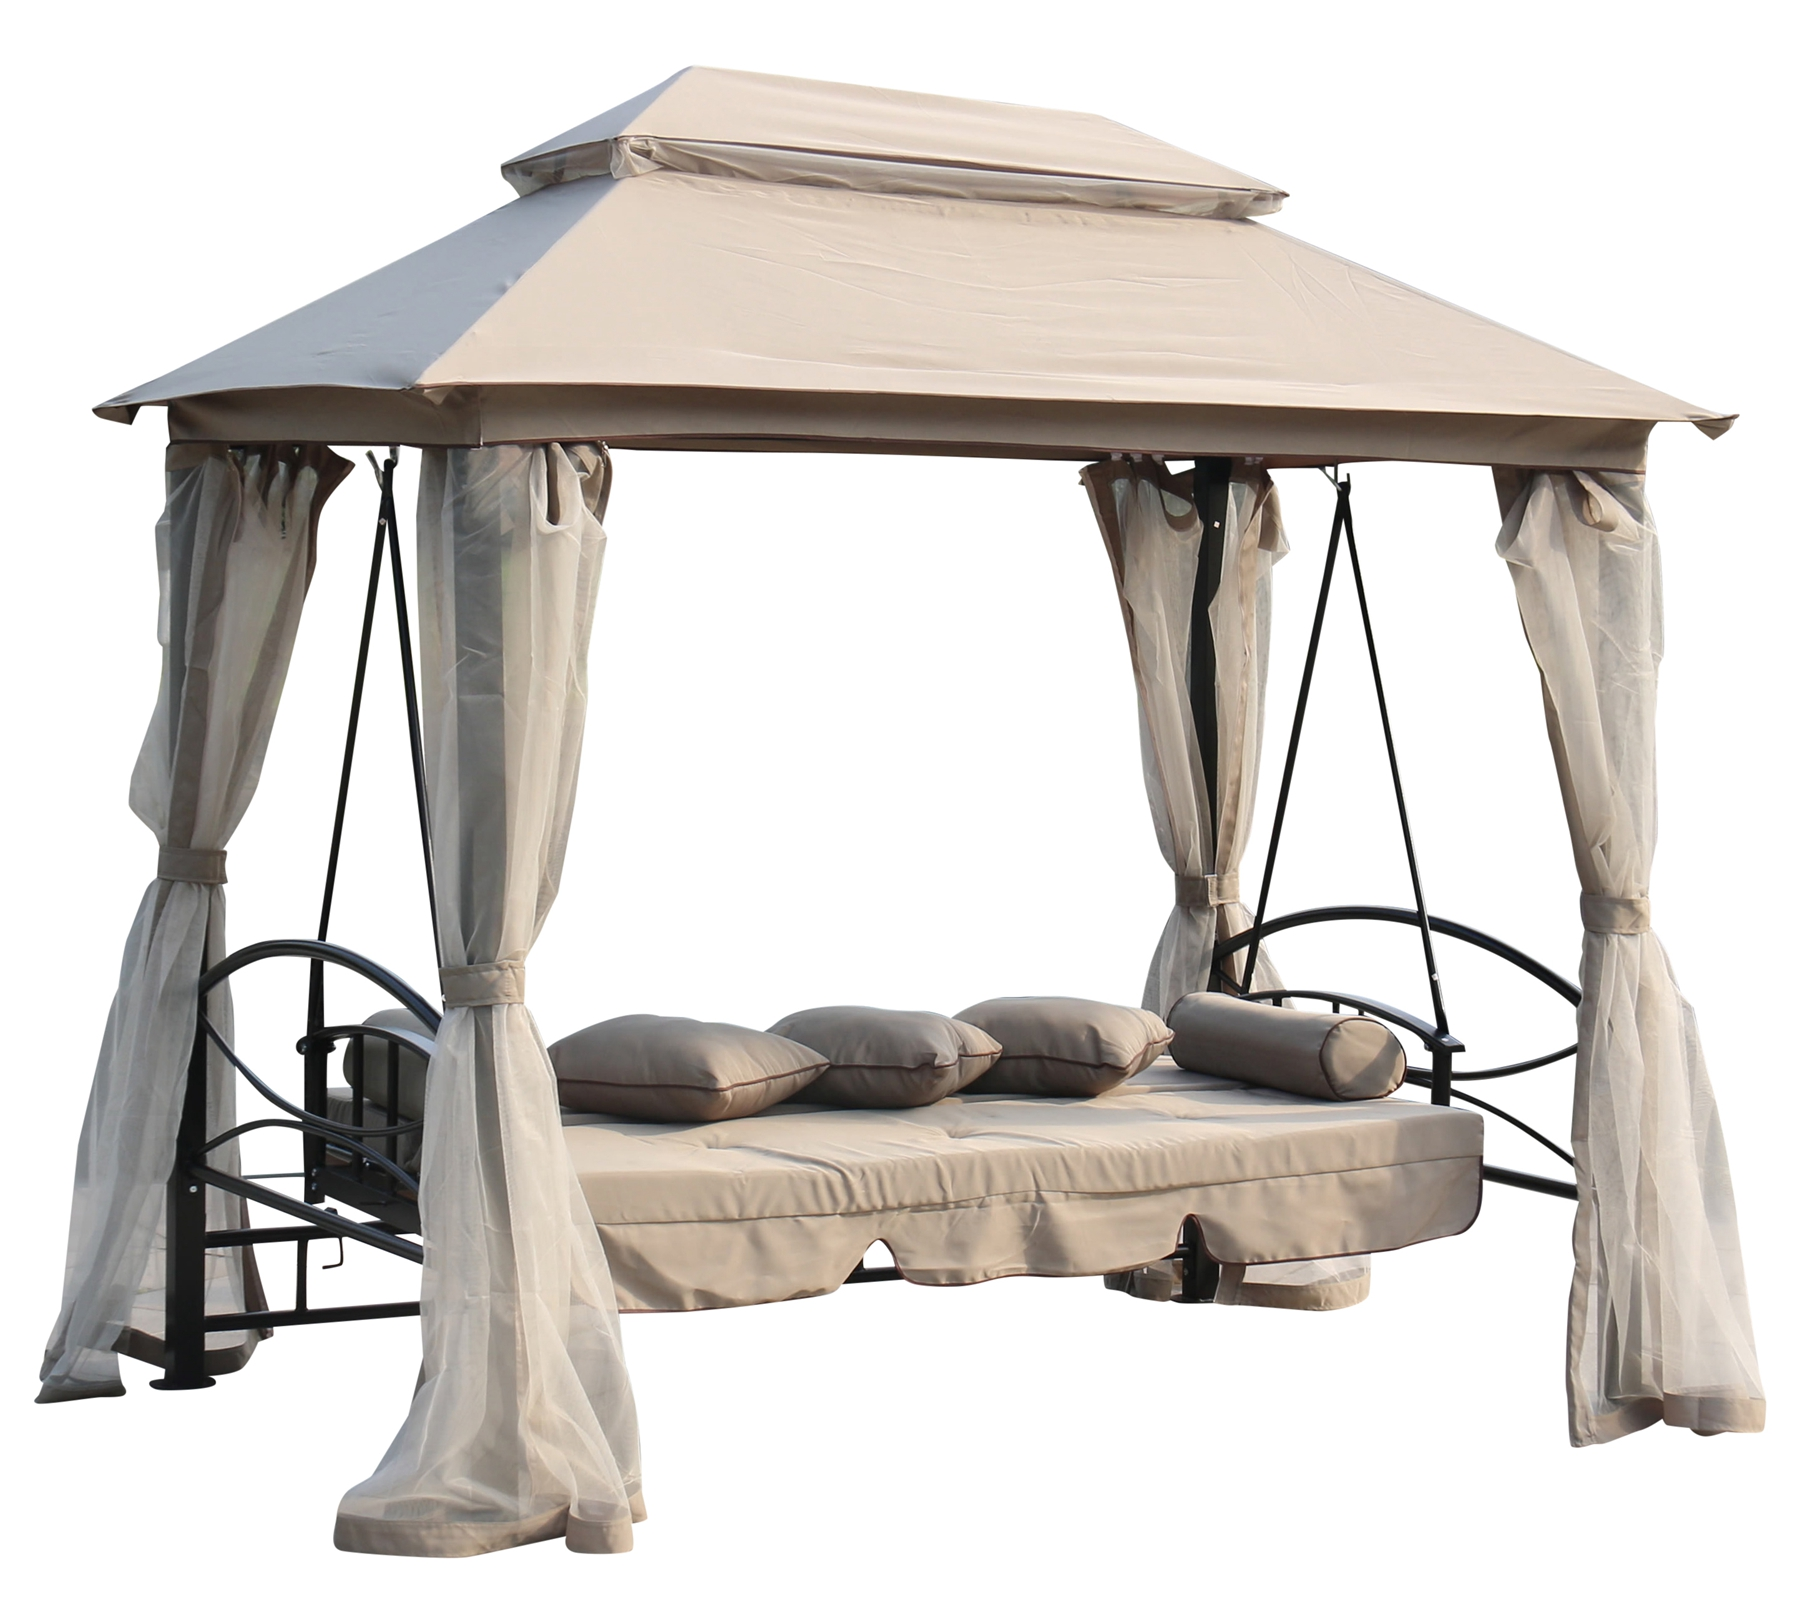 foxhunter garden swing hammock 3 4 seater chair bench bed. Black Bedroom Furniture Sets. Home Design Ideas